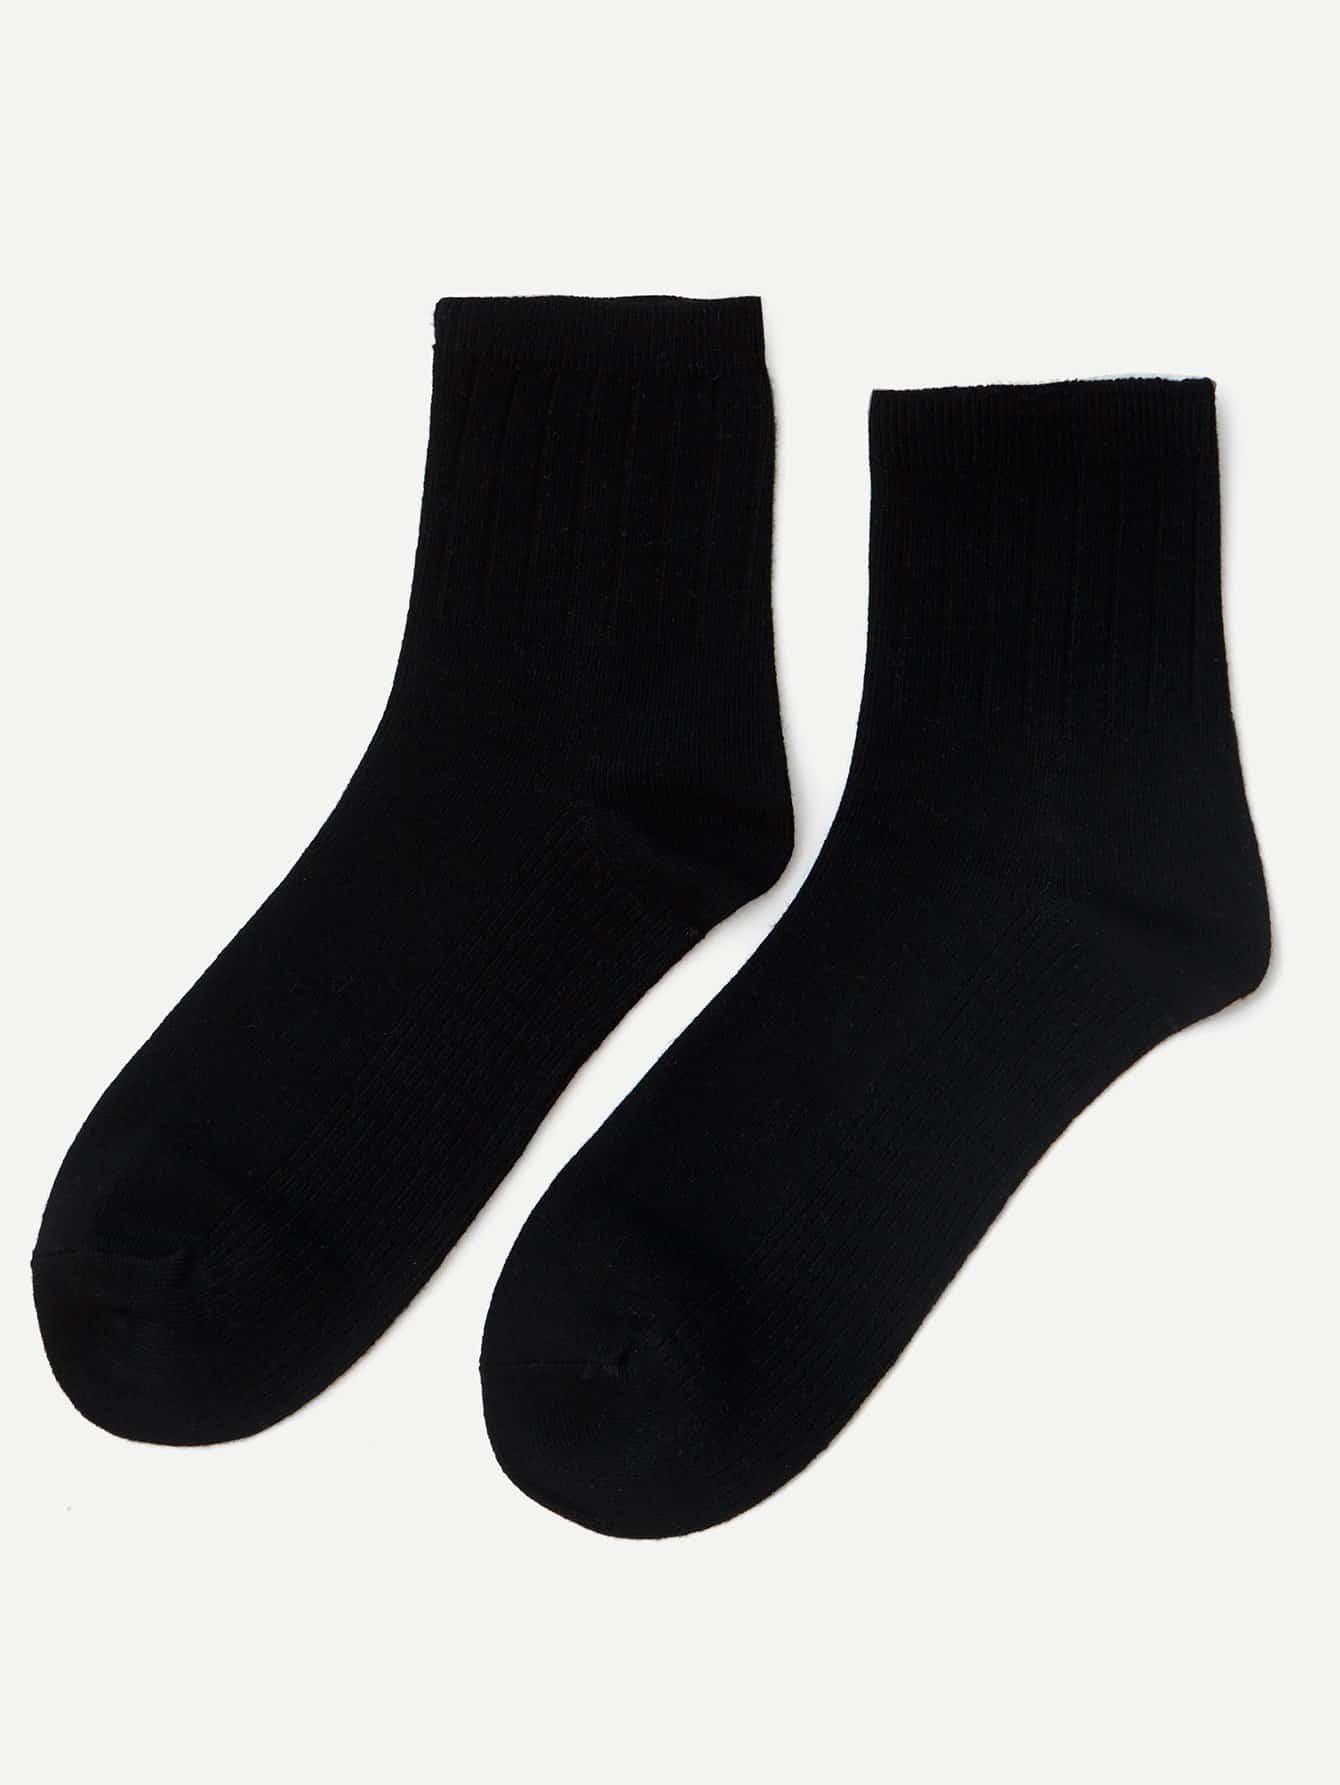 Männer Einfache Knöchel Socken 1Paar